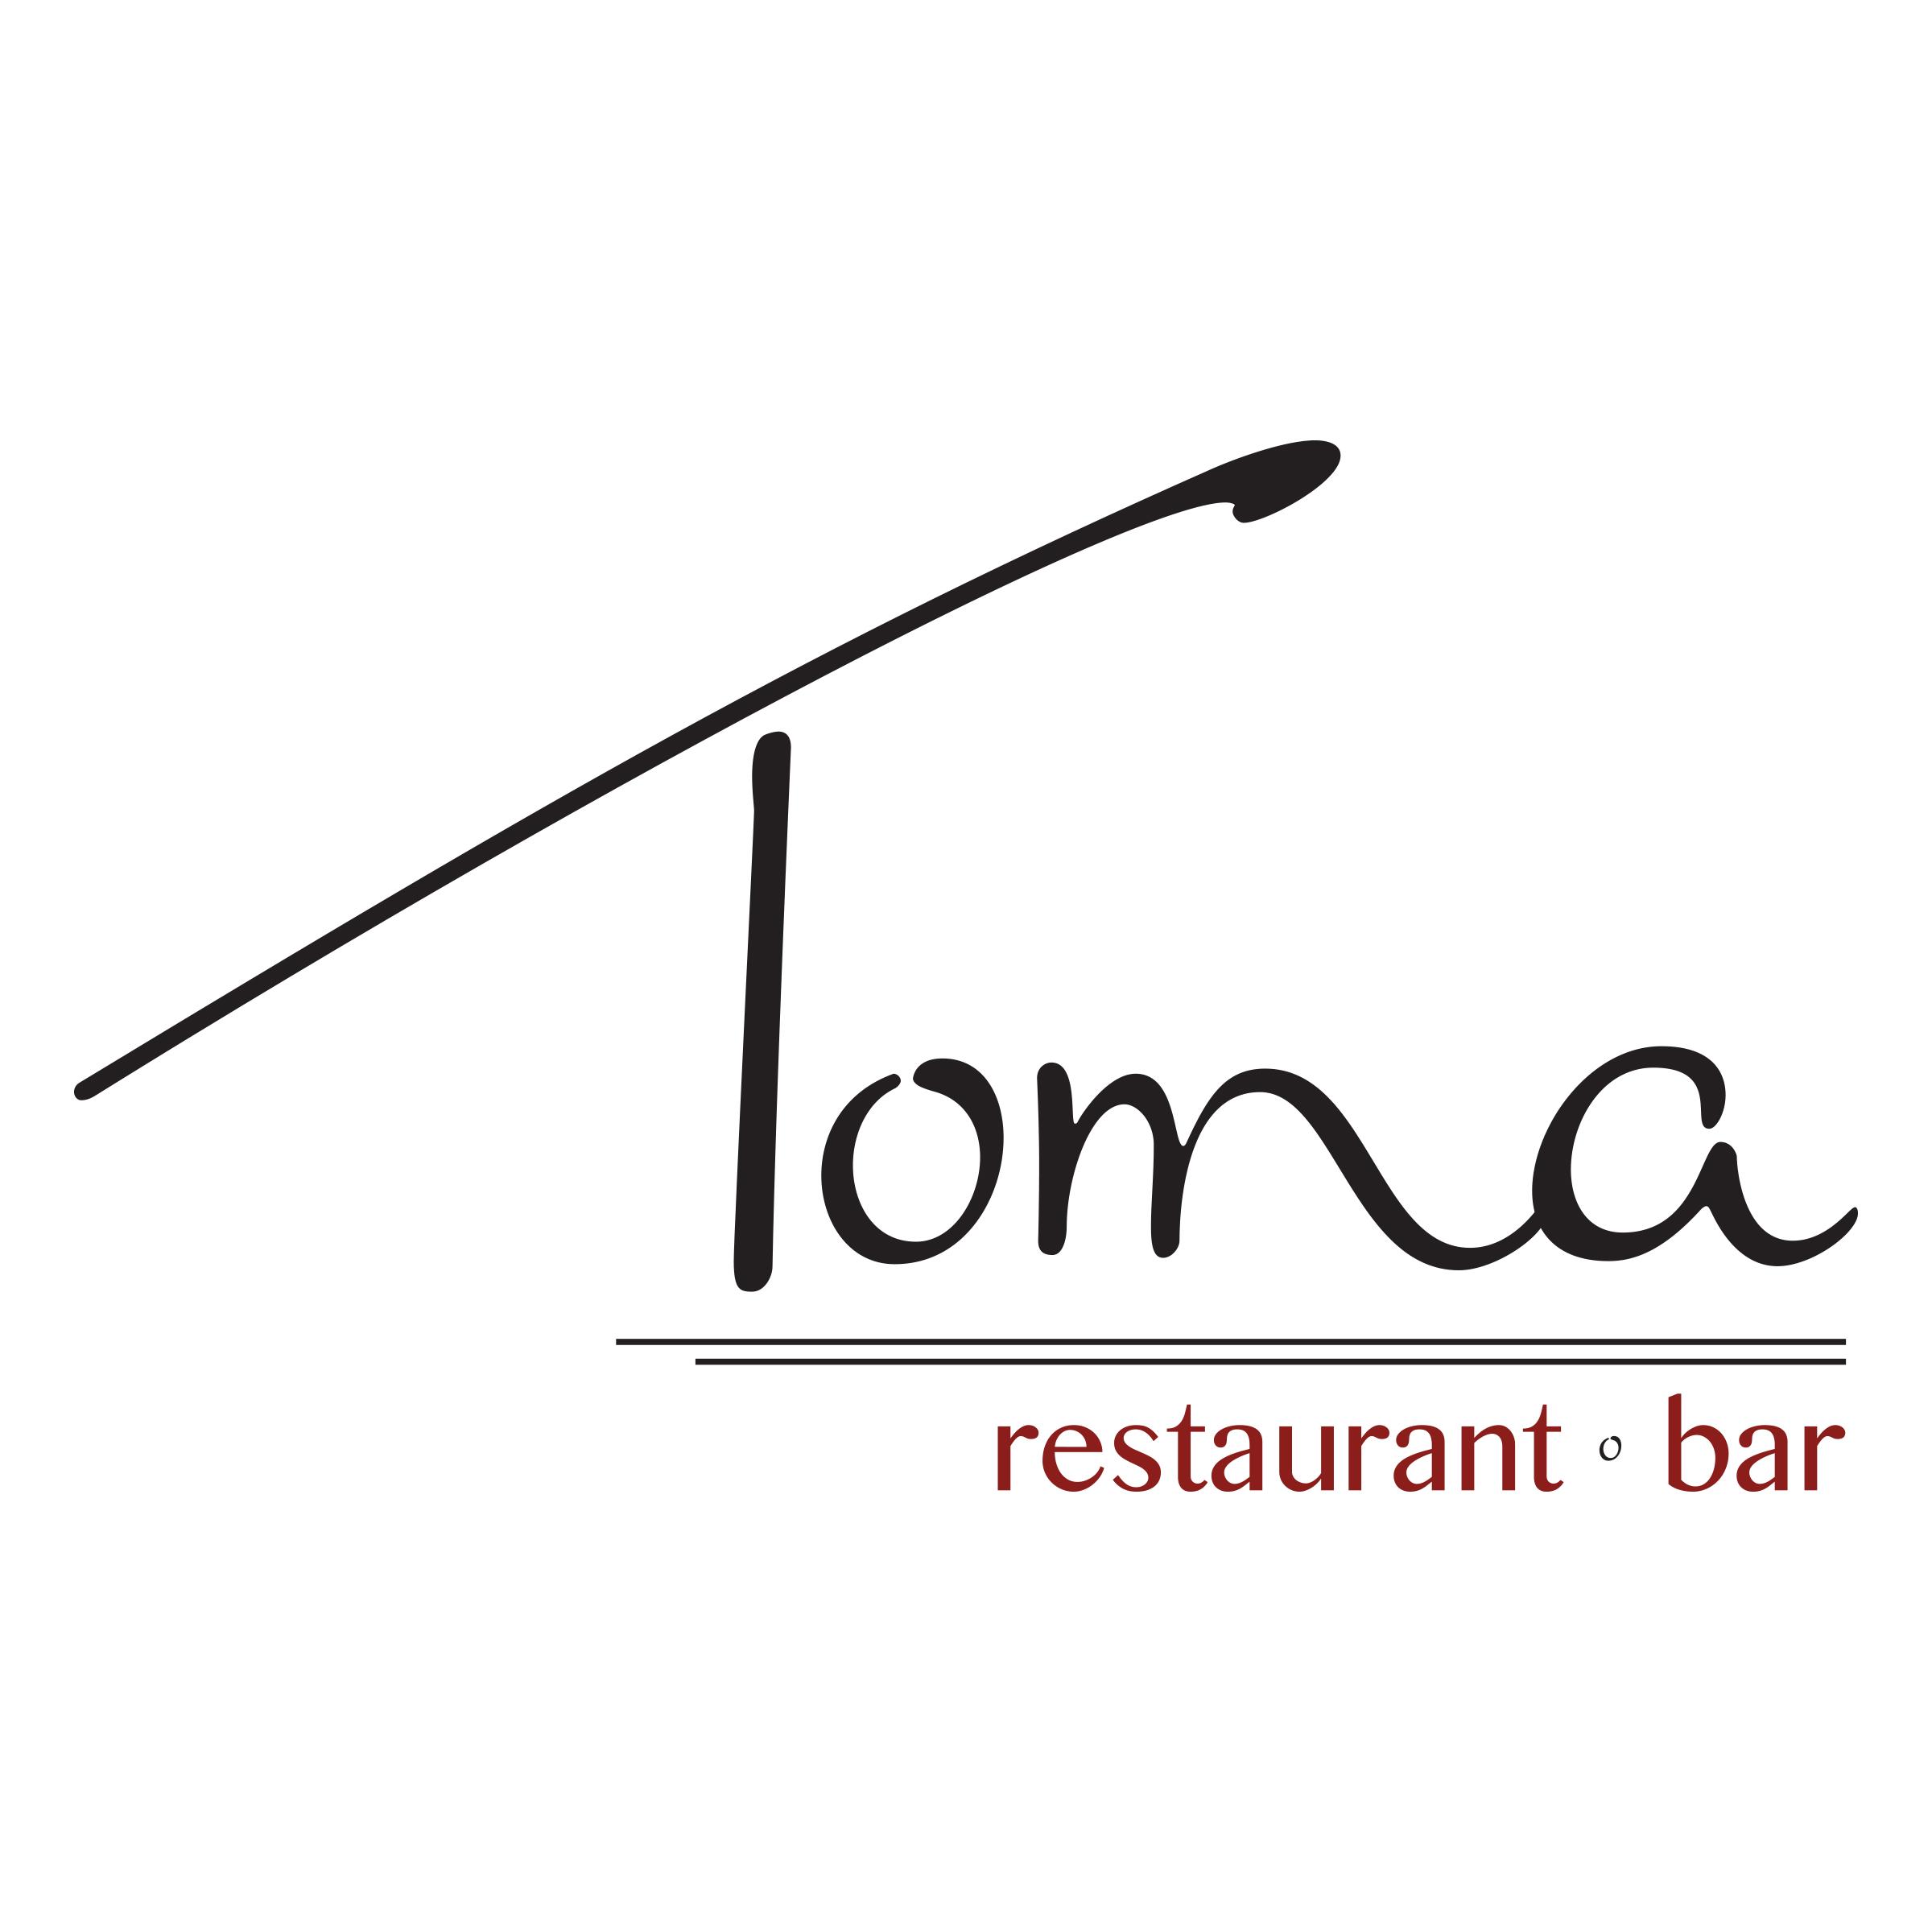 TOMA-Final Jpg.jpg